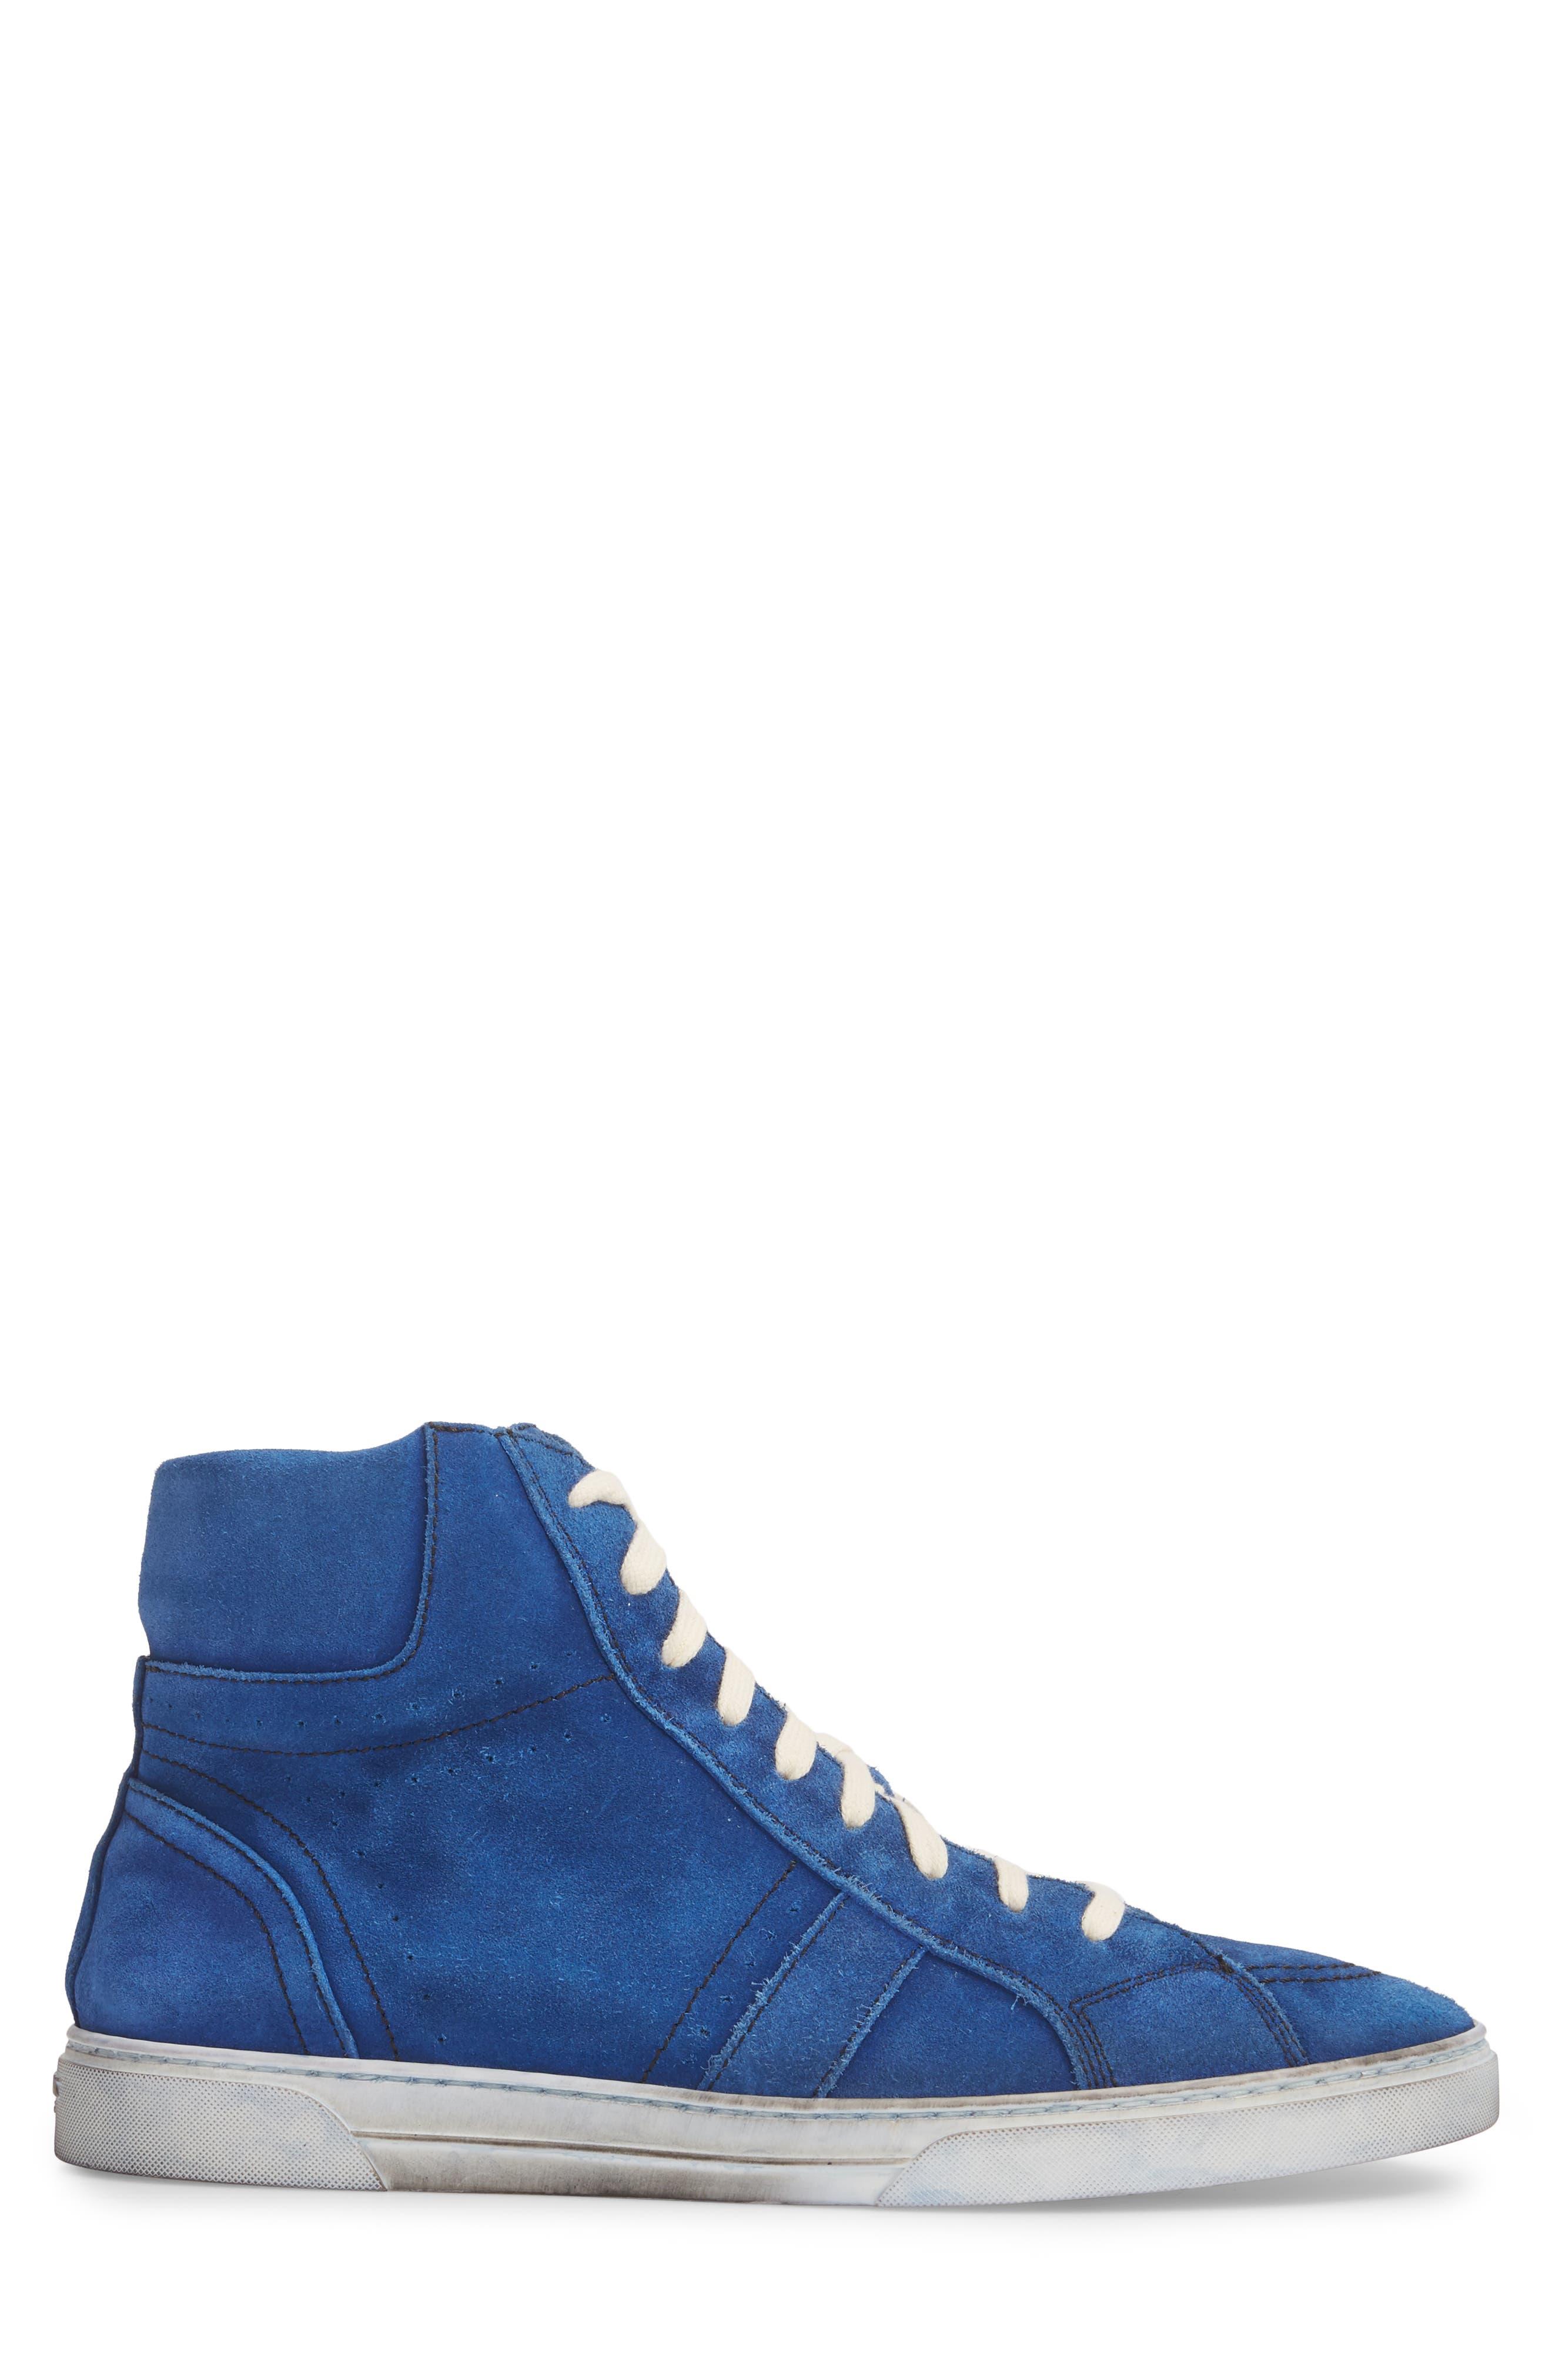 High Top Sneaker,                             Alternate thumbnail 3, color,                             400